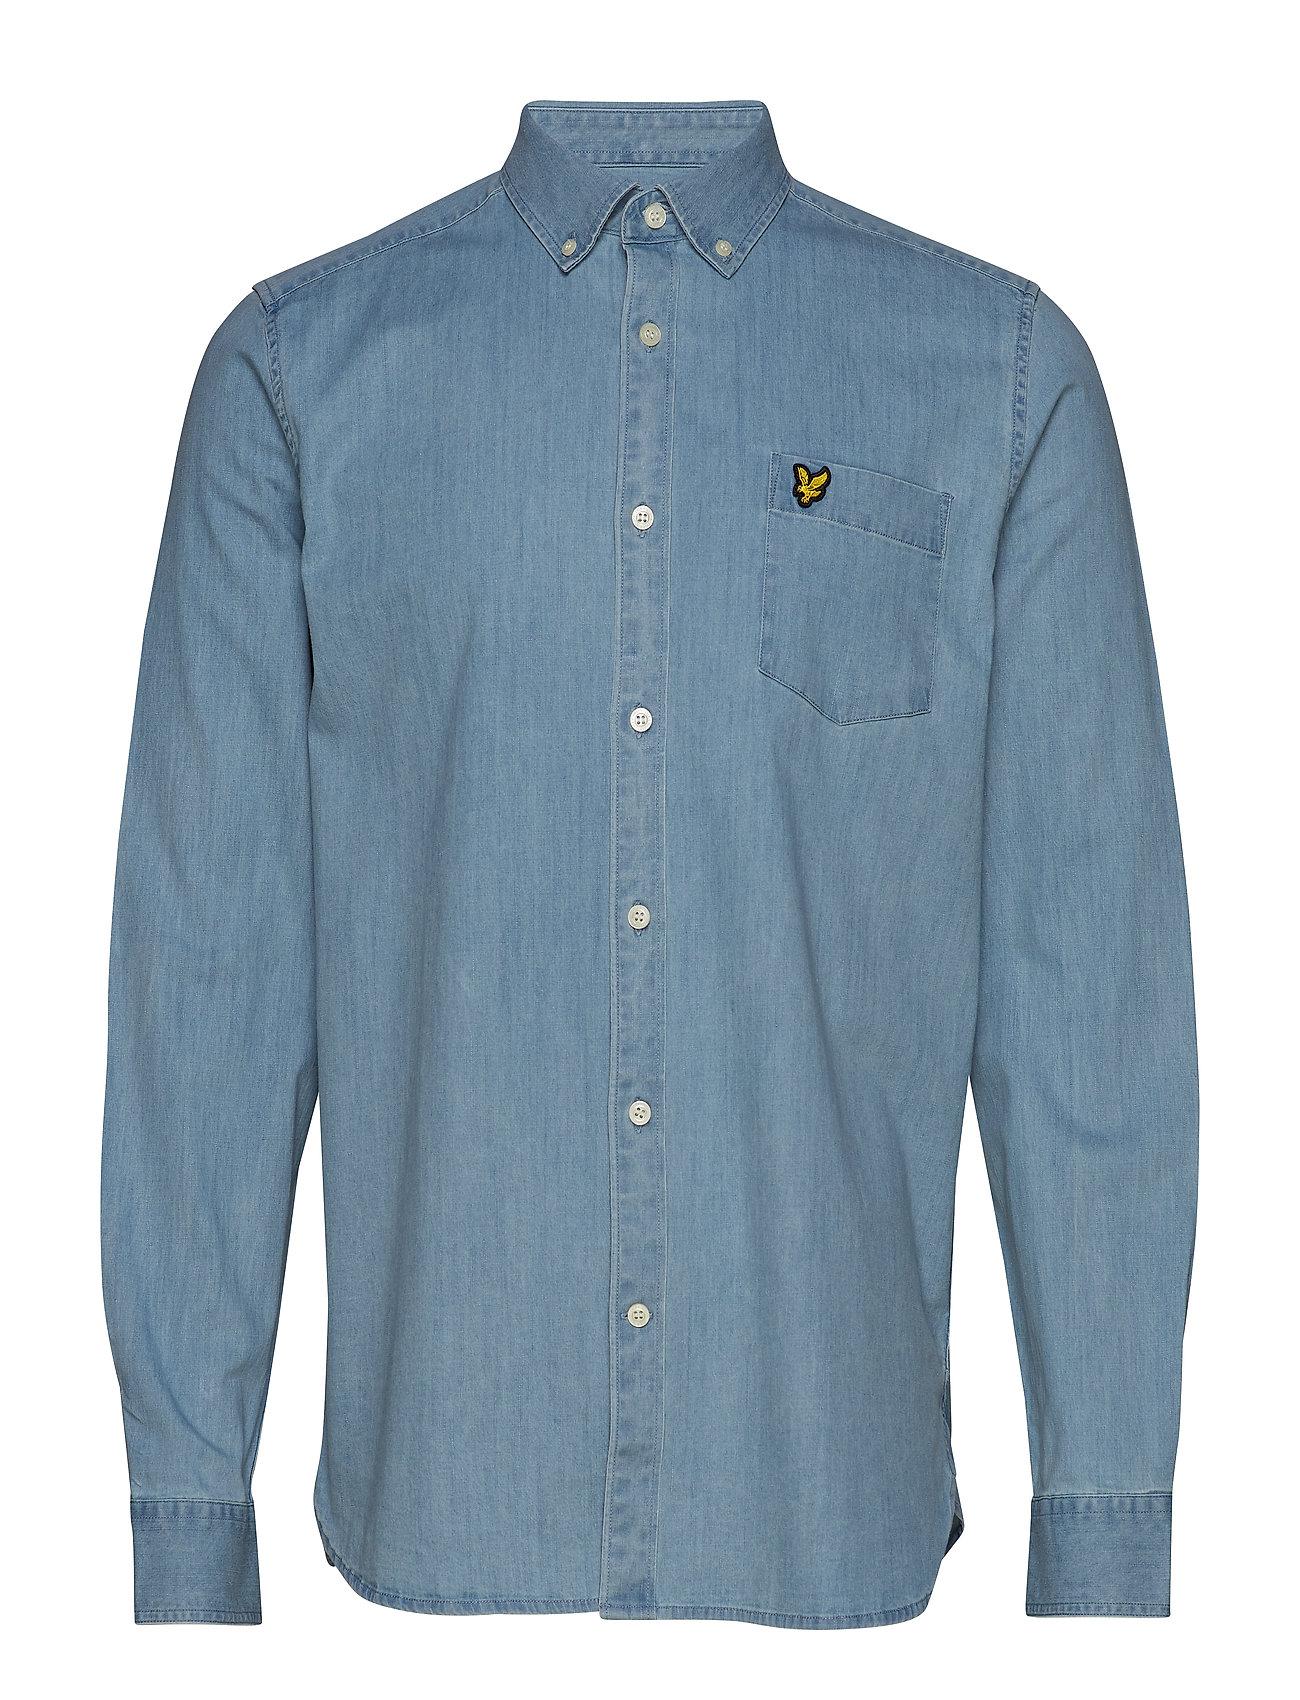 Lyle & Scott Regular Fit Denim Shirt - WASHED INDIGO